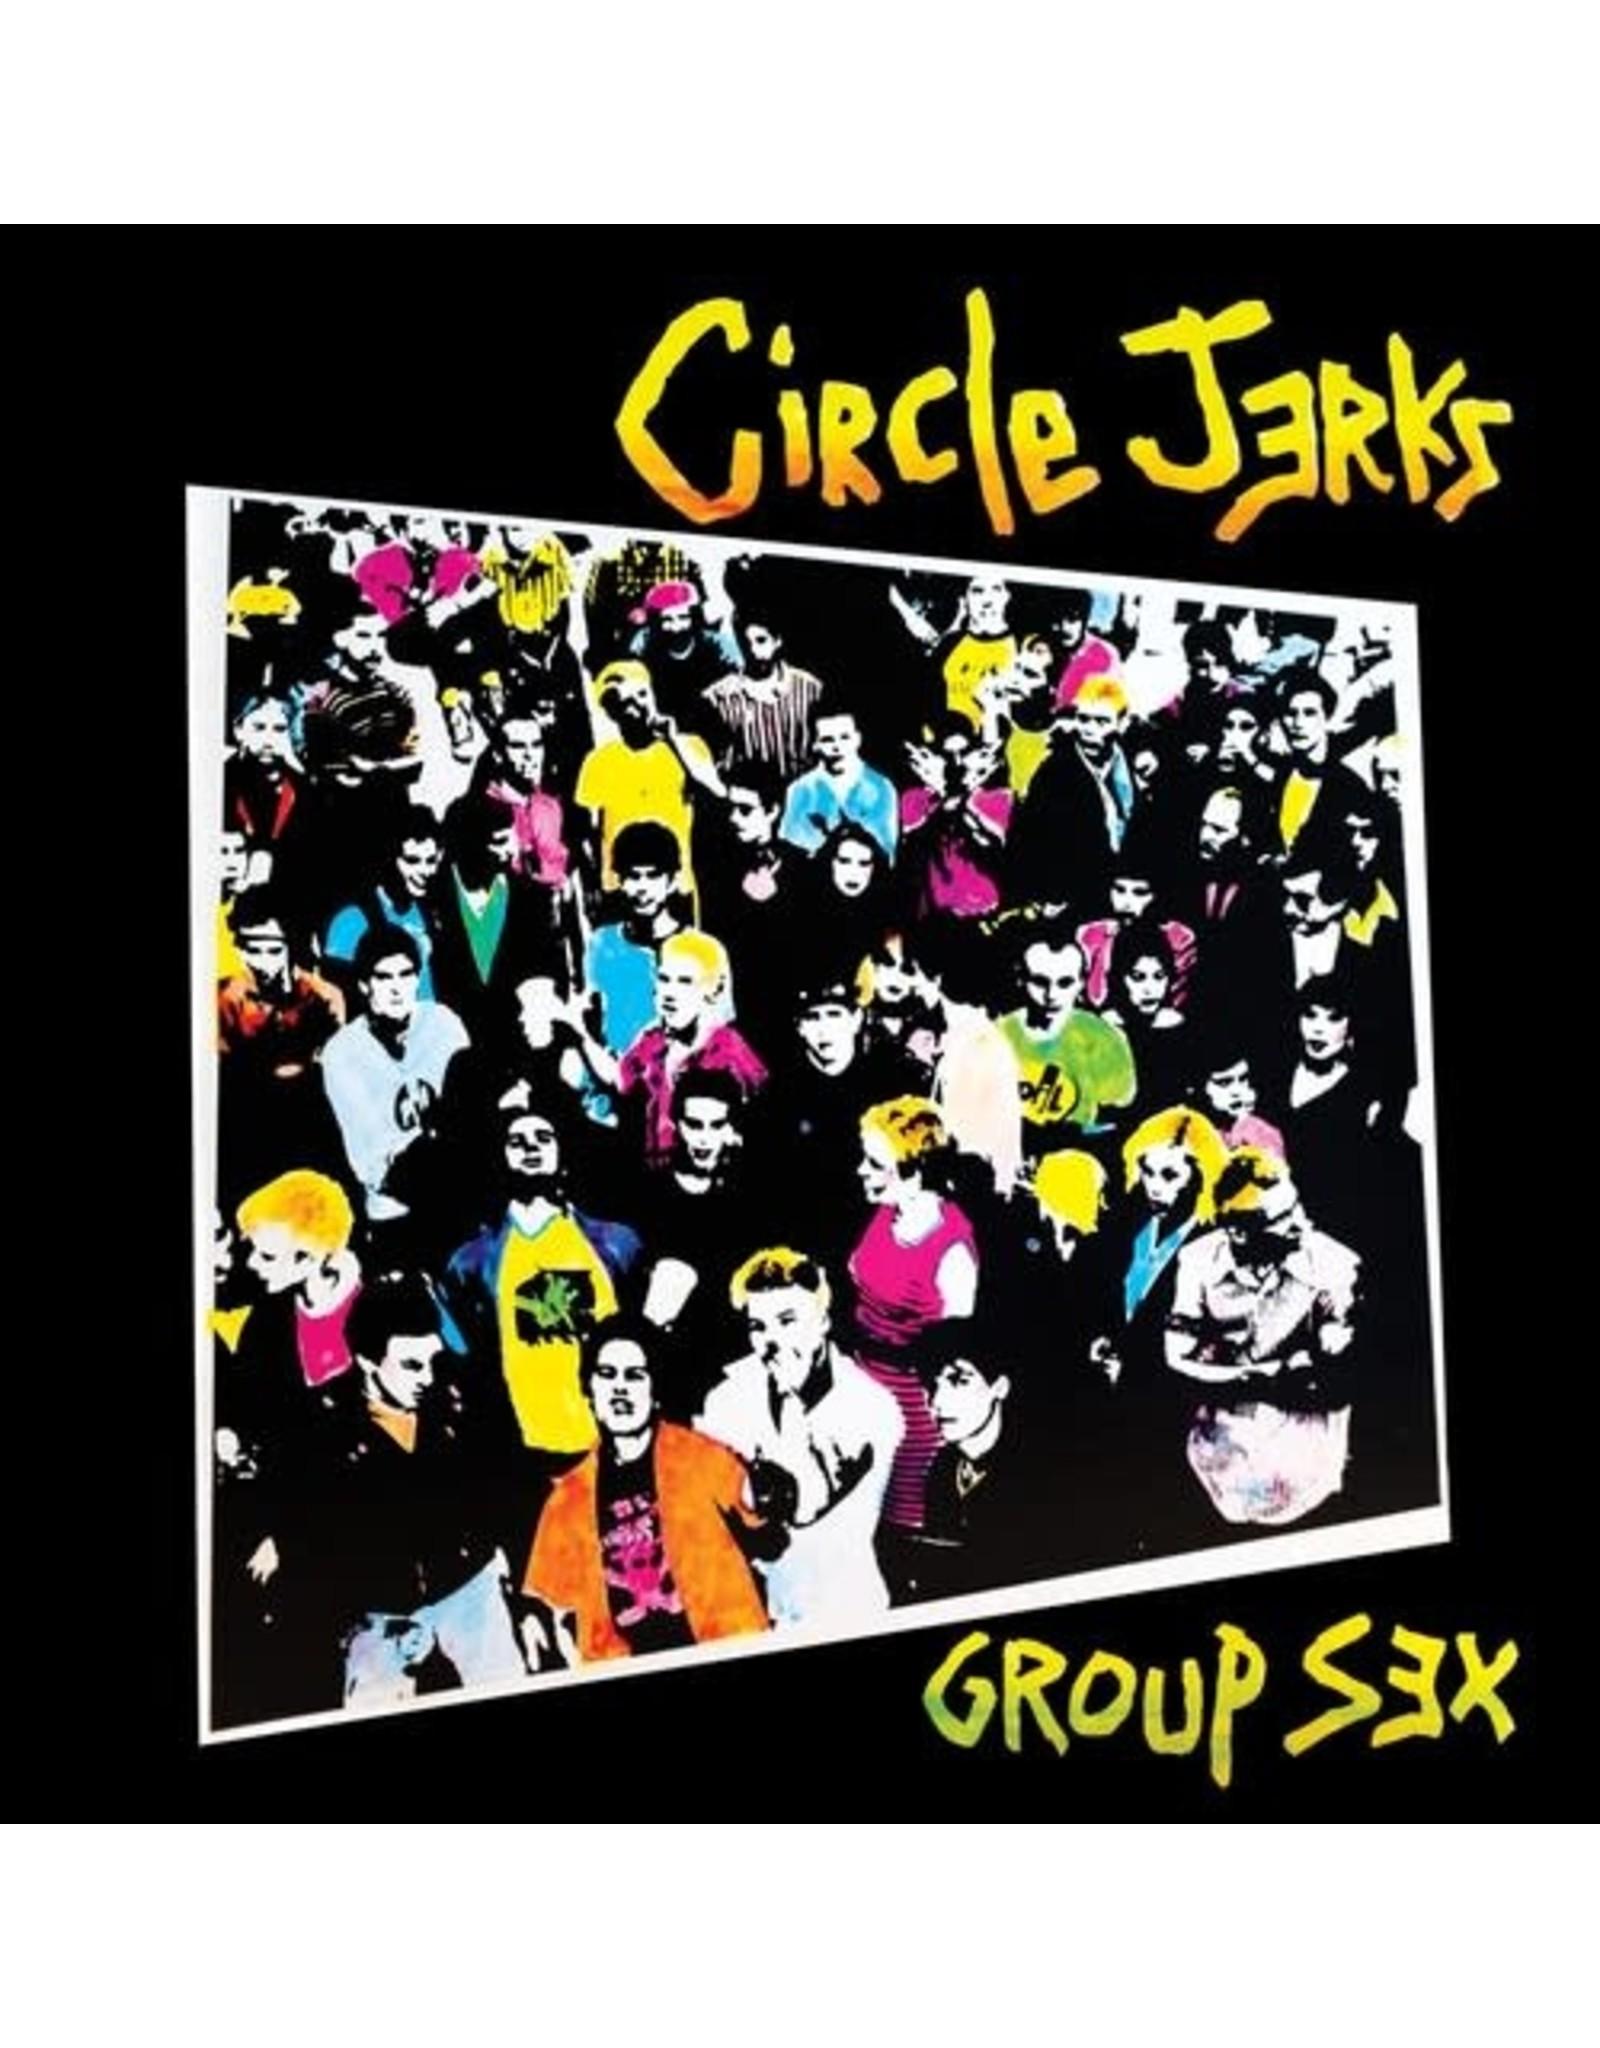 New Vinyl Circle Jerks - Group Sex (40th Anniversary) LP